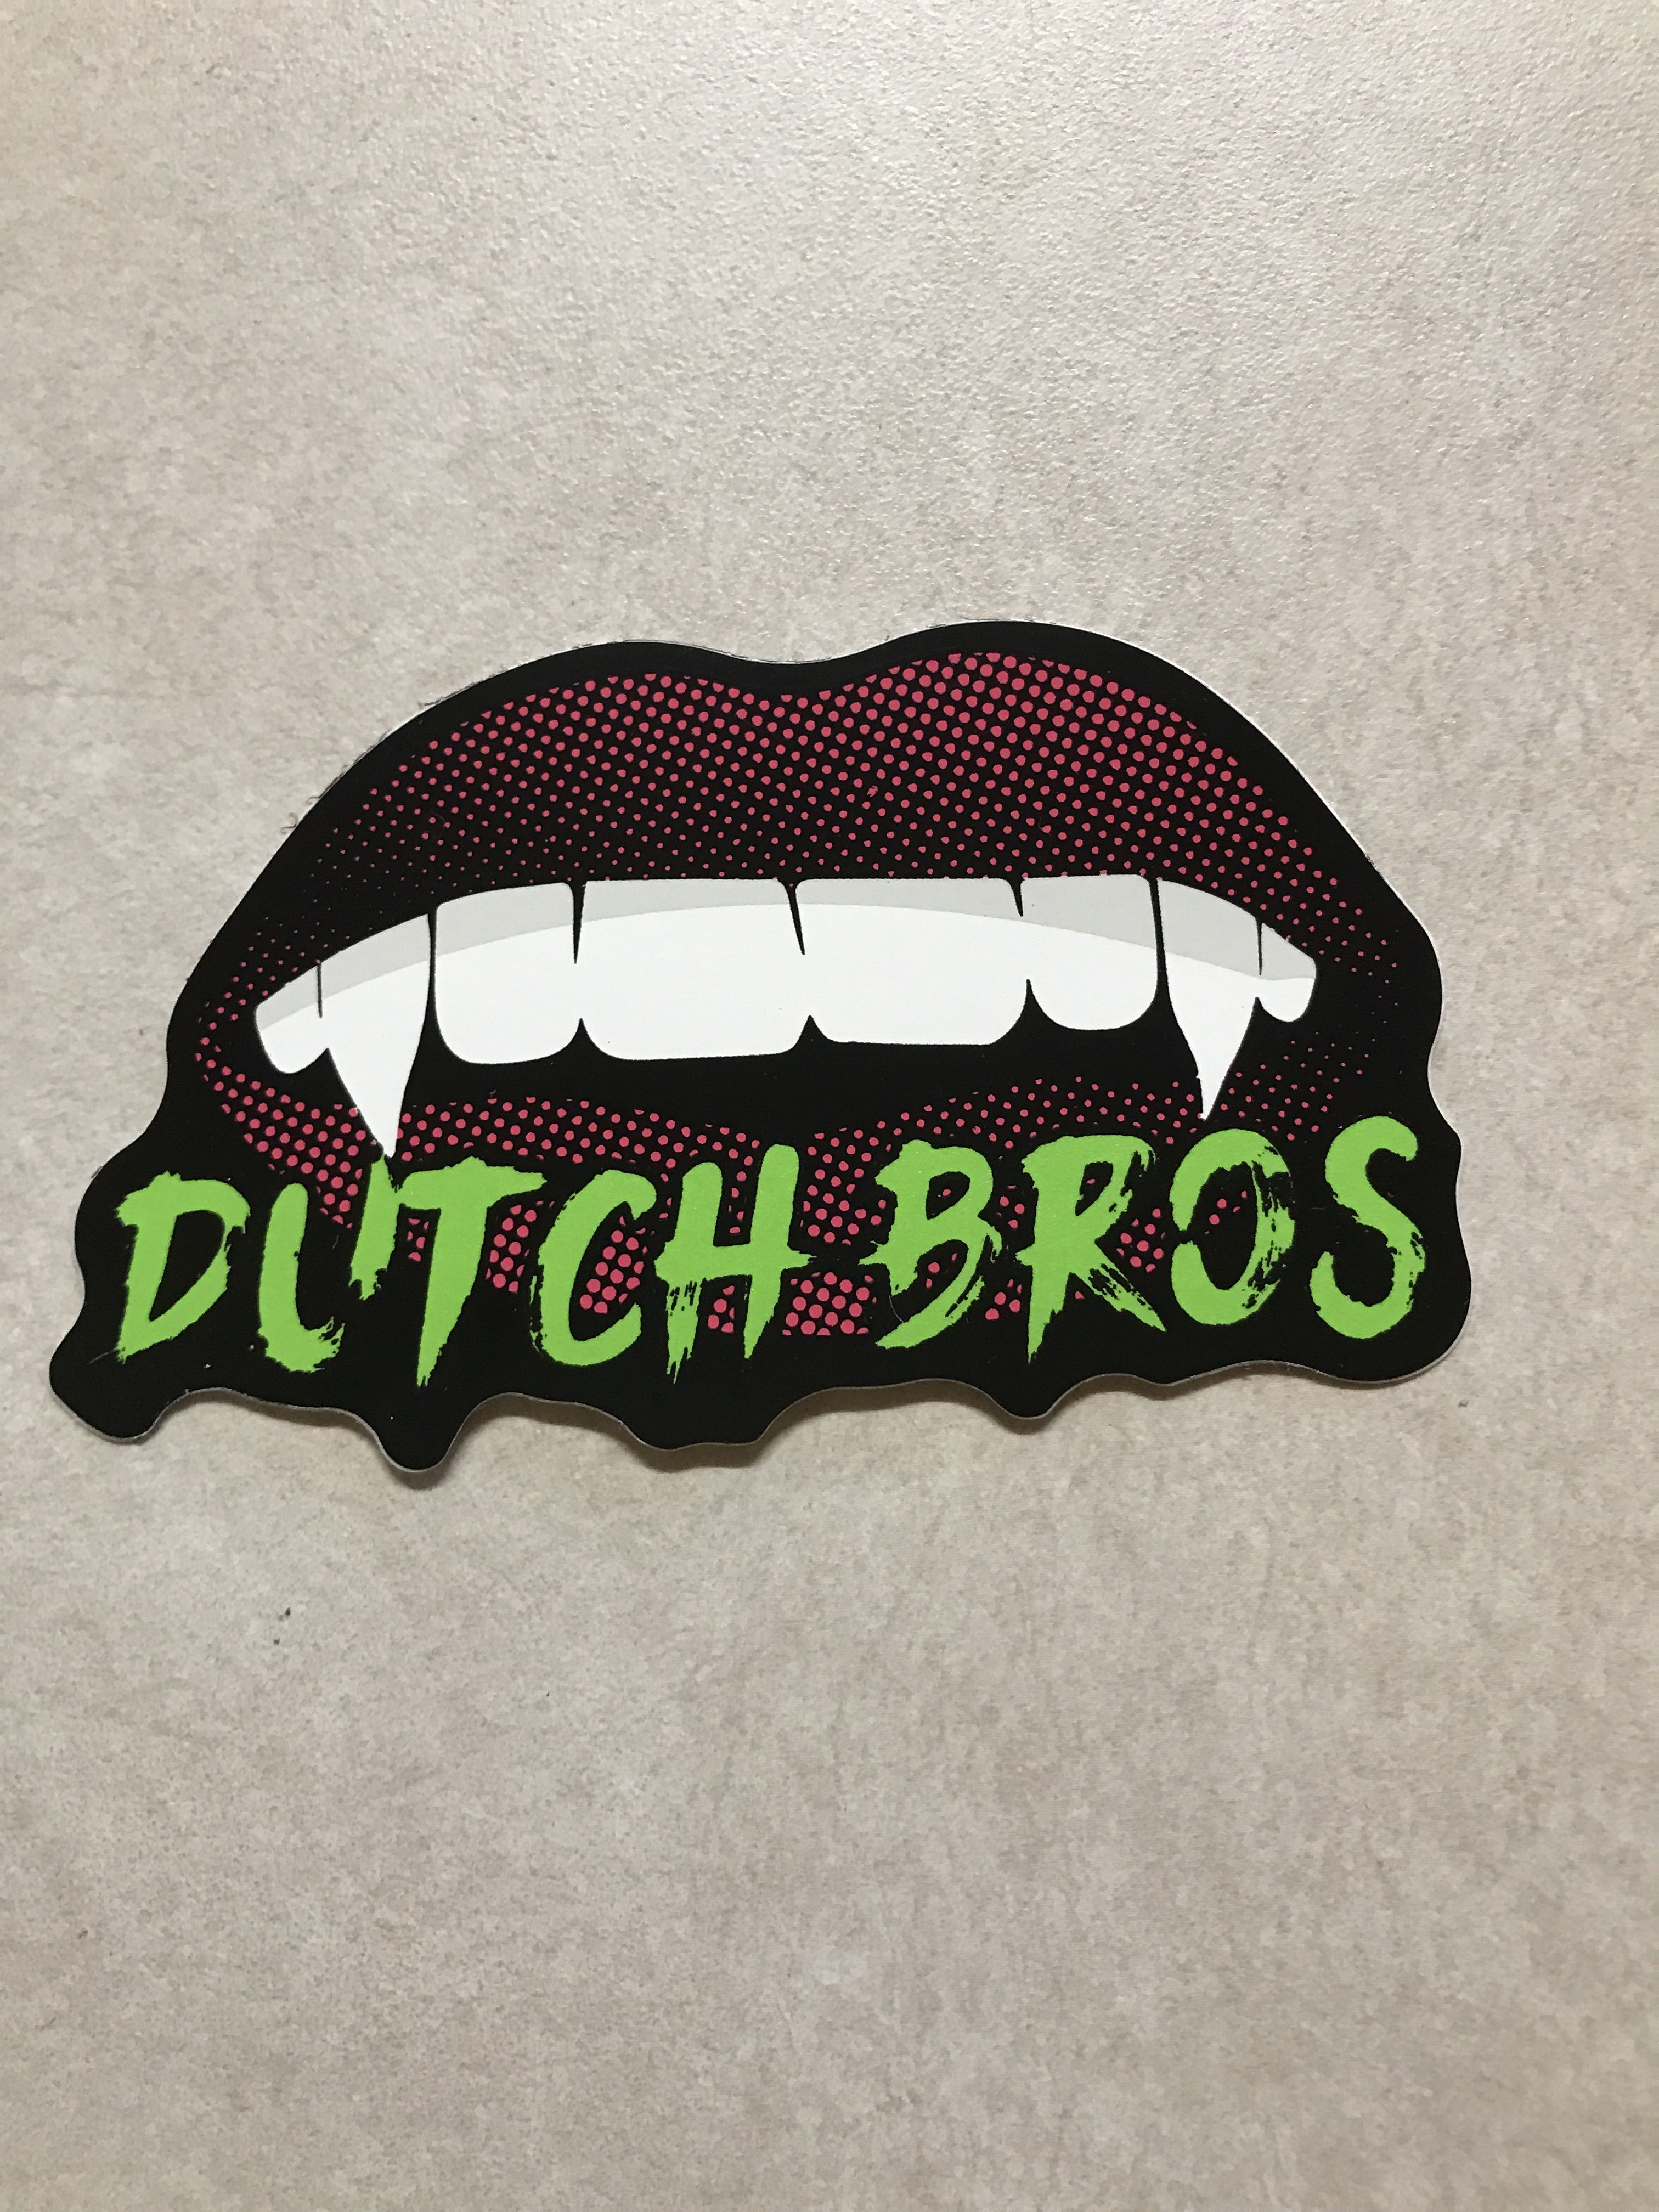 how to check a dutch bros gift card balance